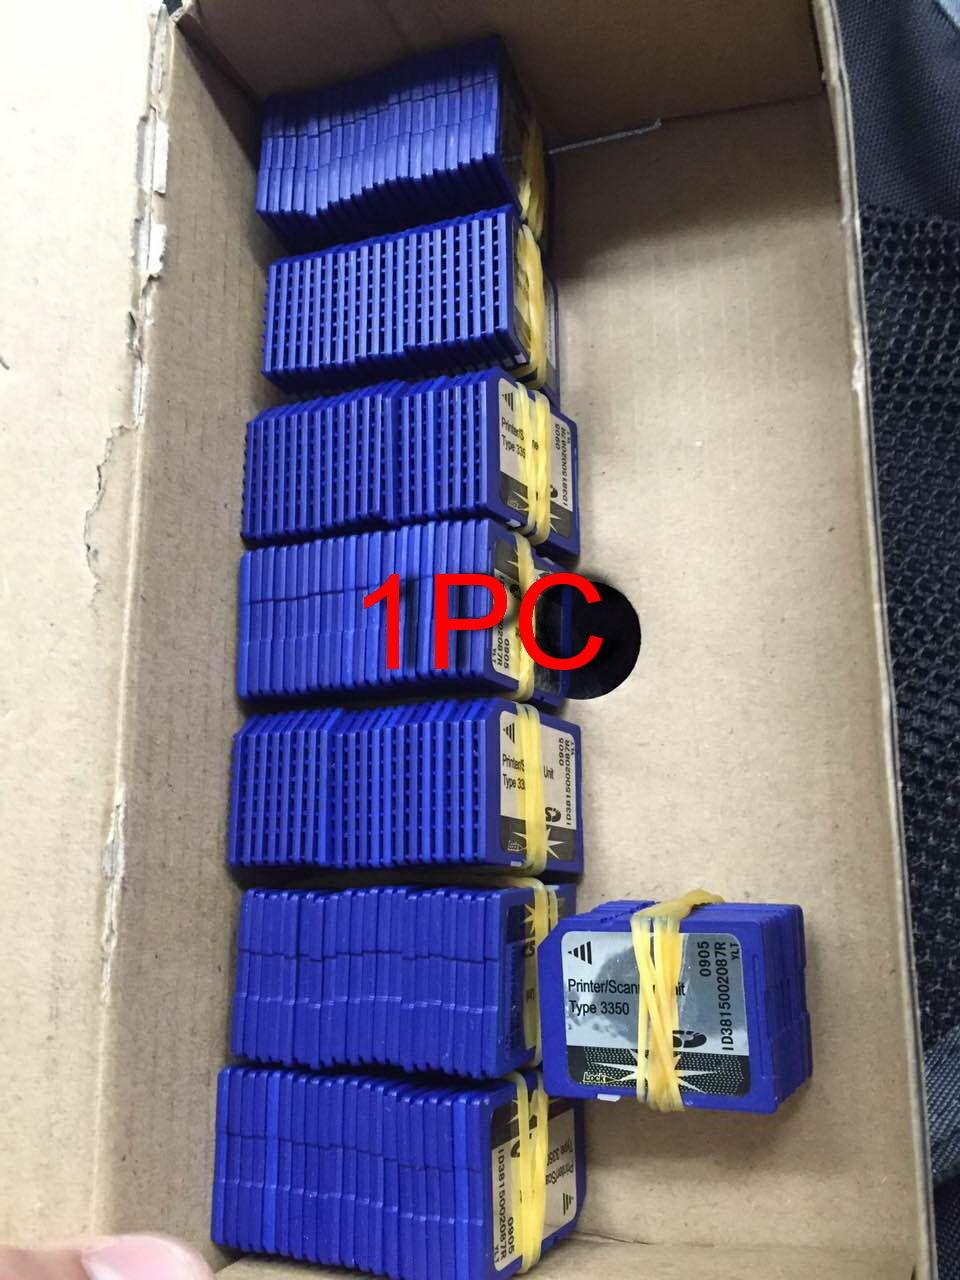 SD CARD FOR RICOH MP 4002 5002 PostScript Unit type sd card<br>